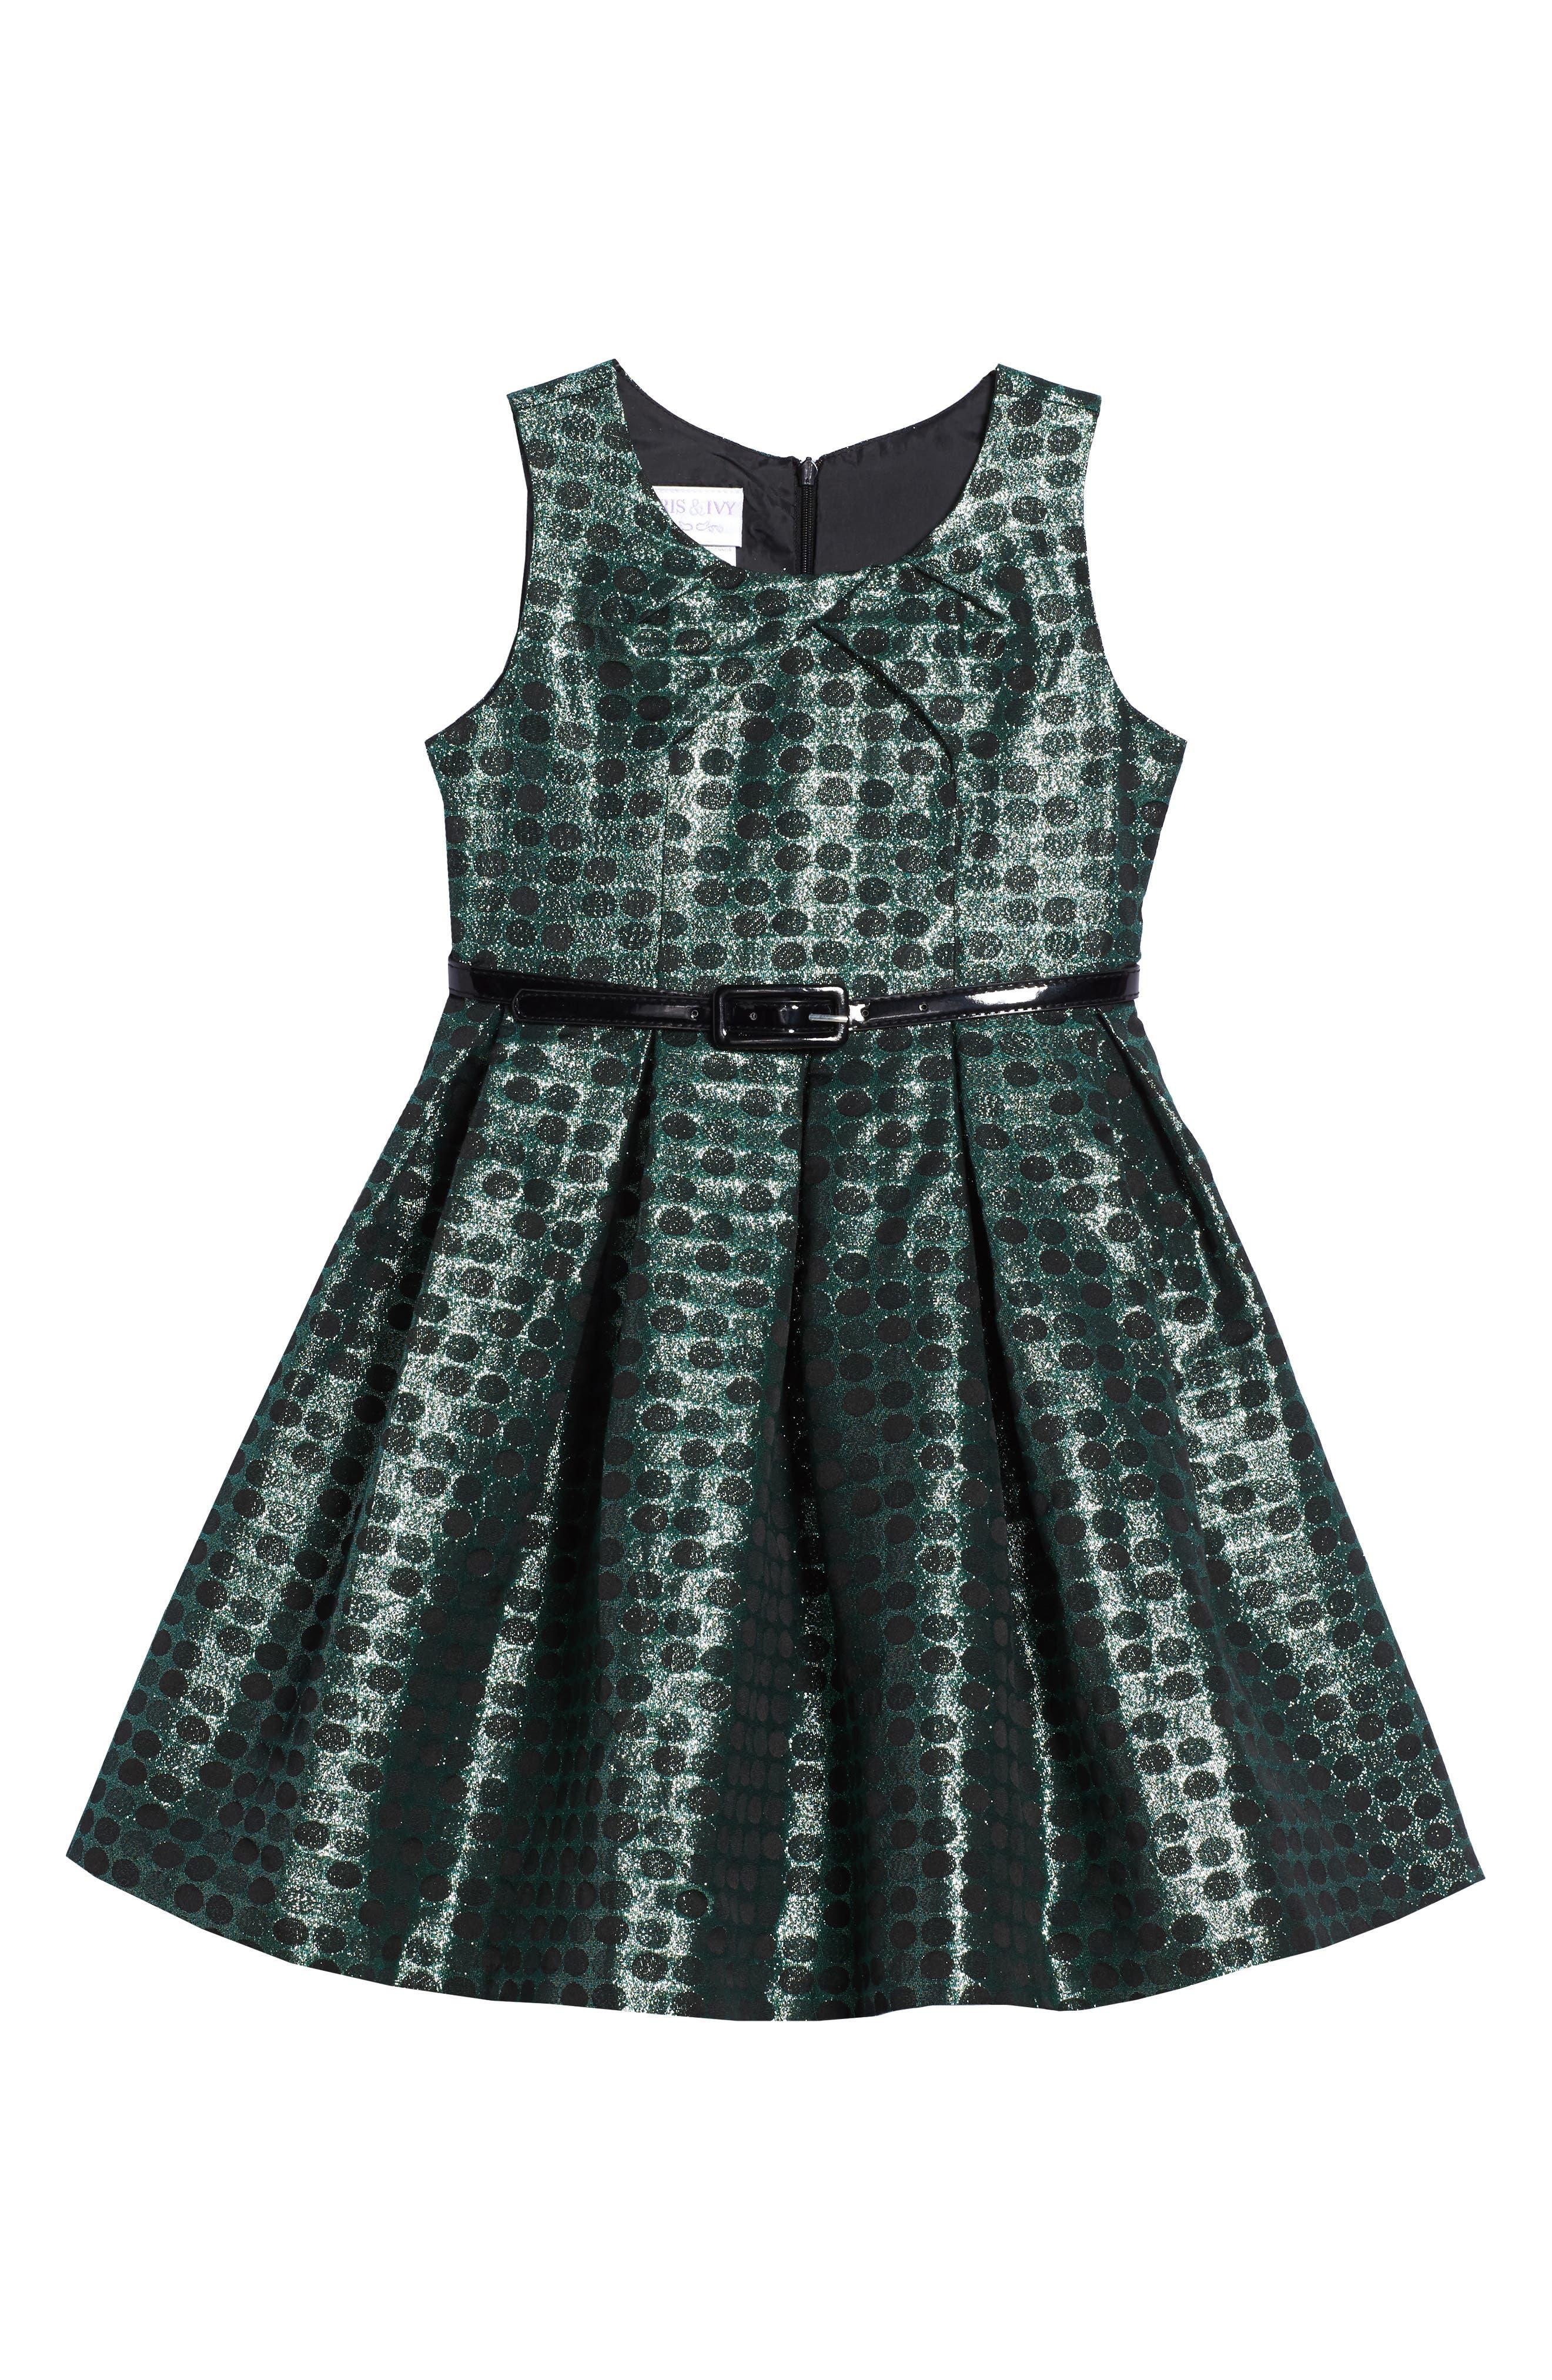 Iris & Ivy Jacquard Dot Dress (Toddler Girls & Little Girls)